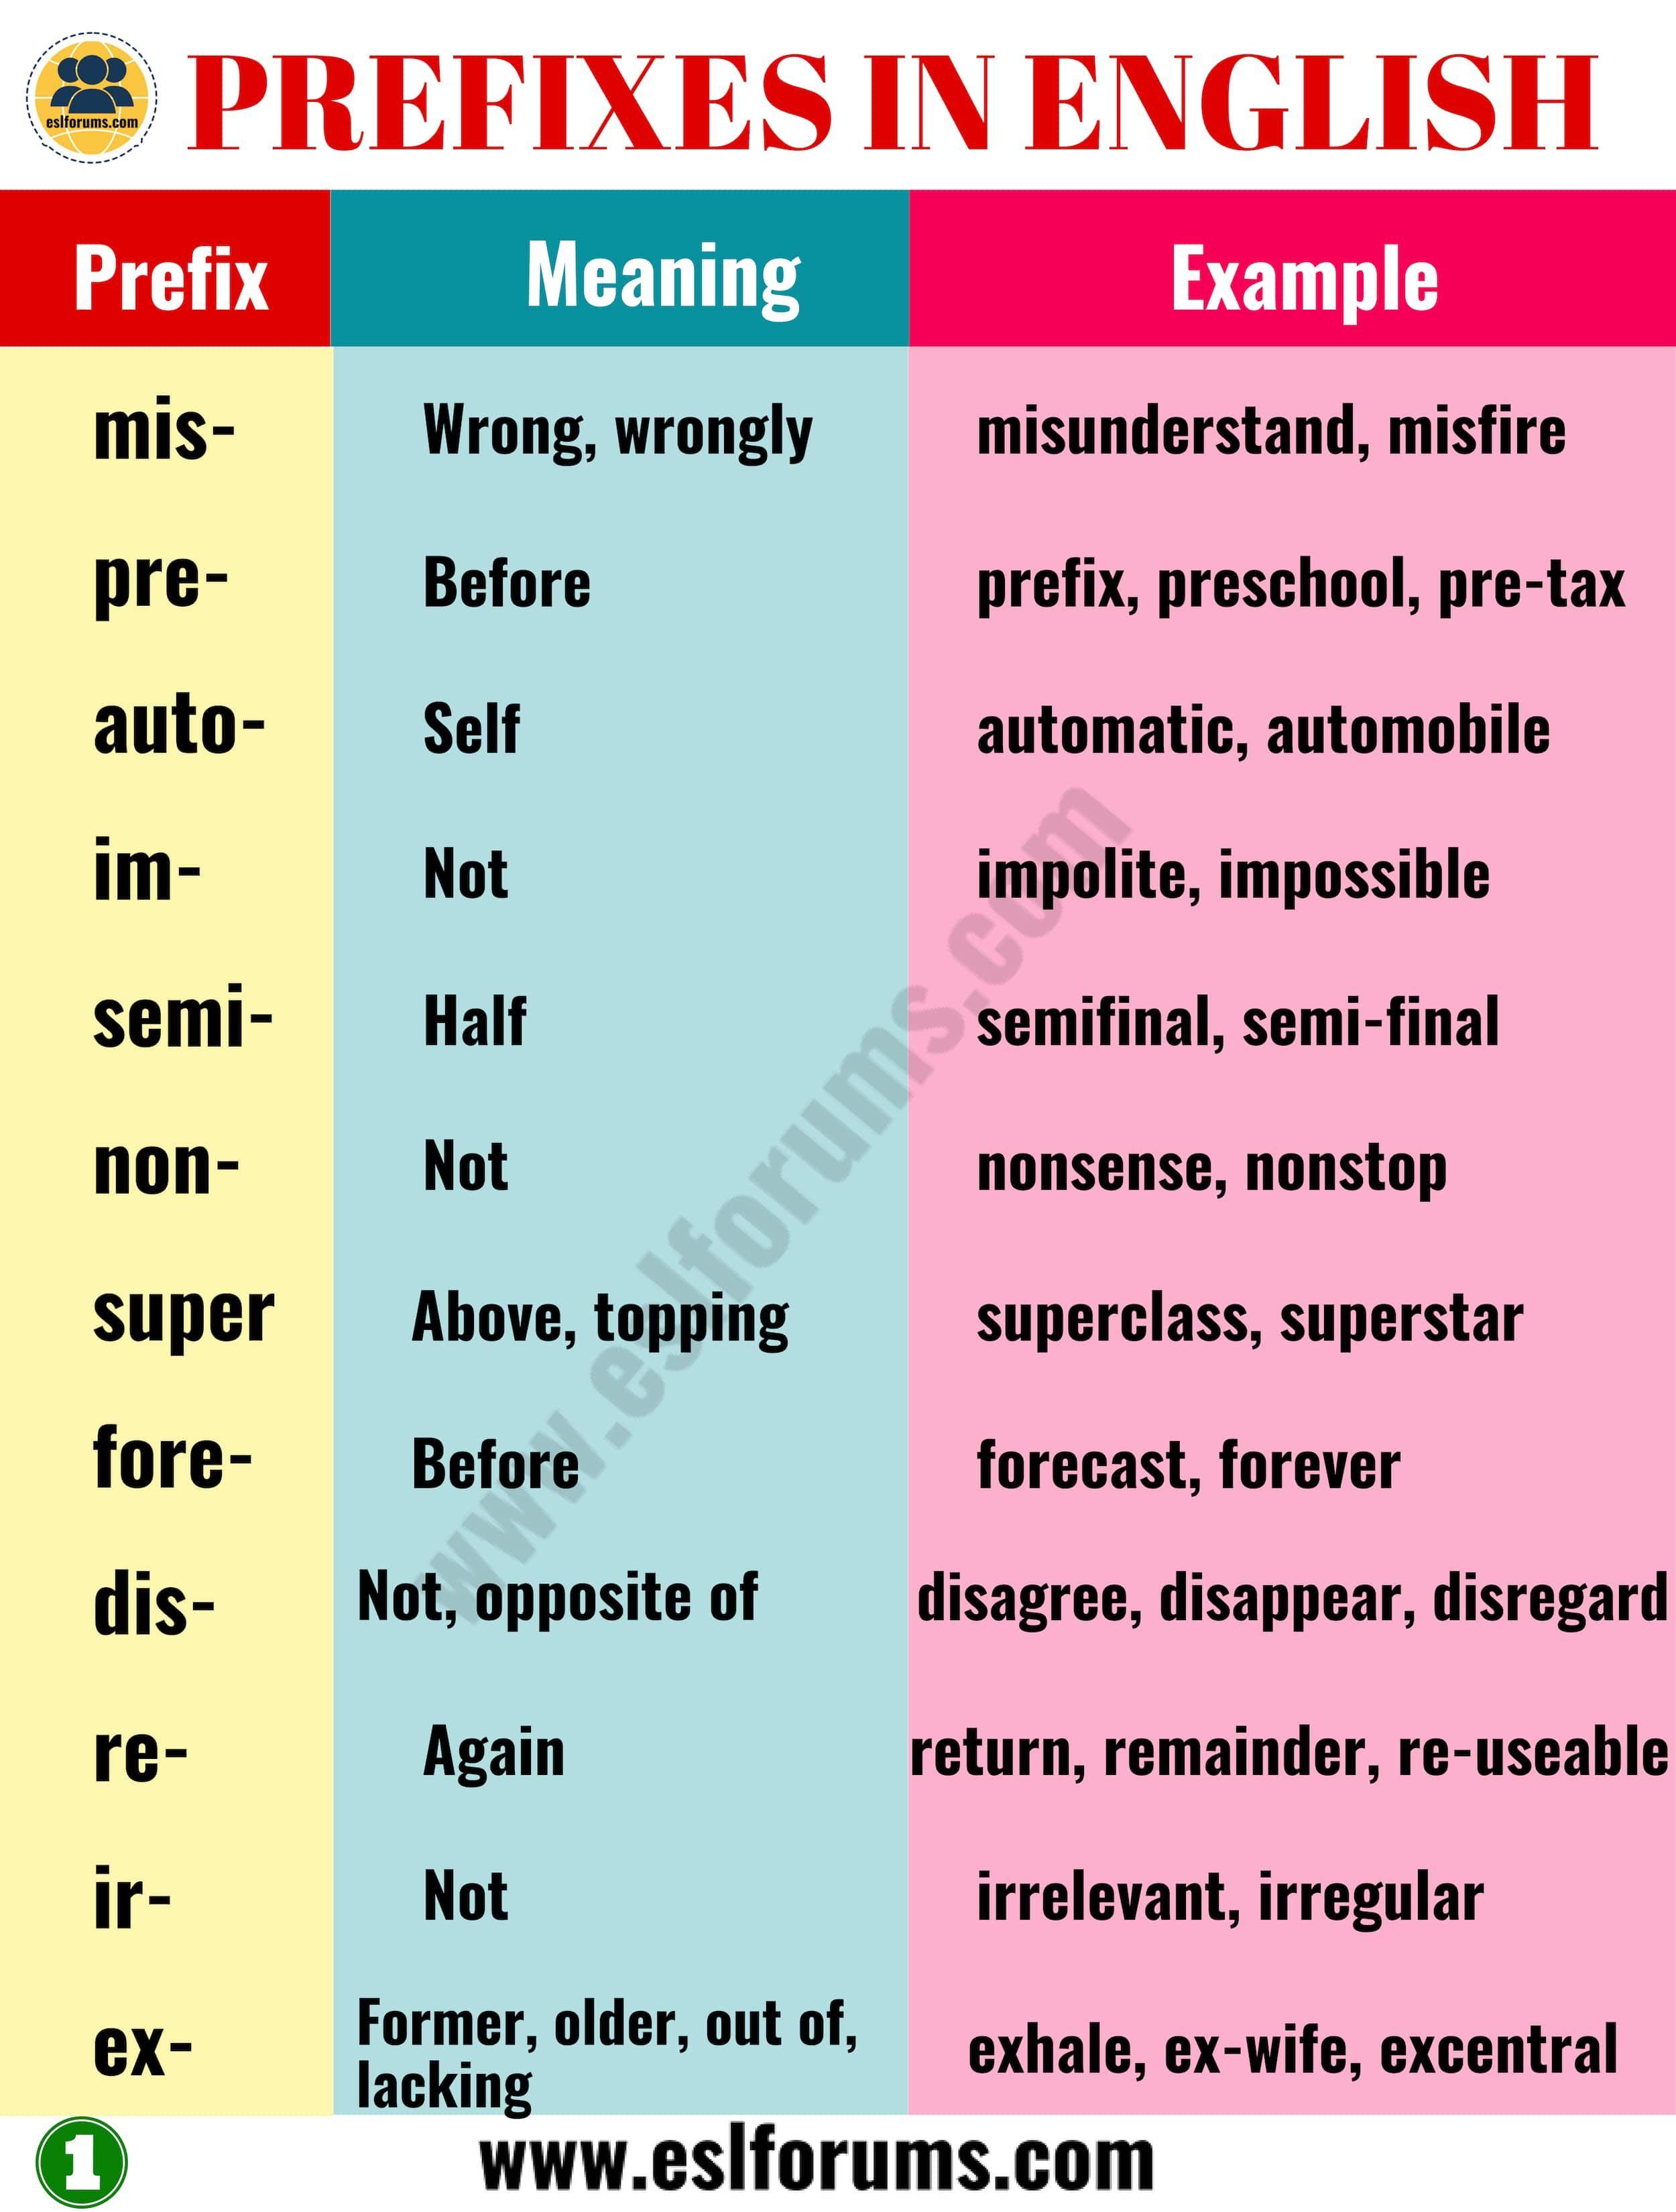 35 Most Common Prefixes In English